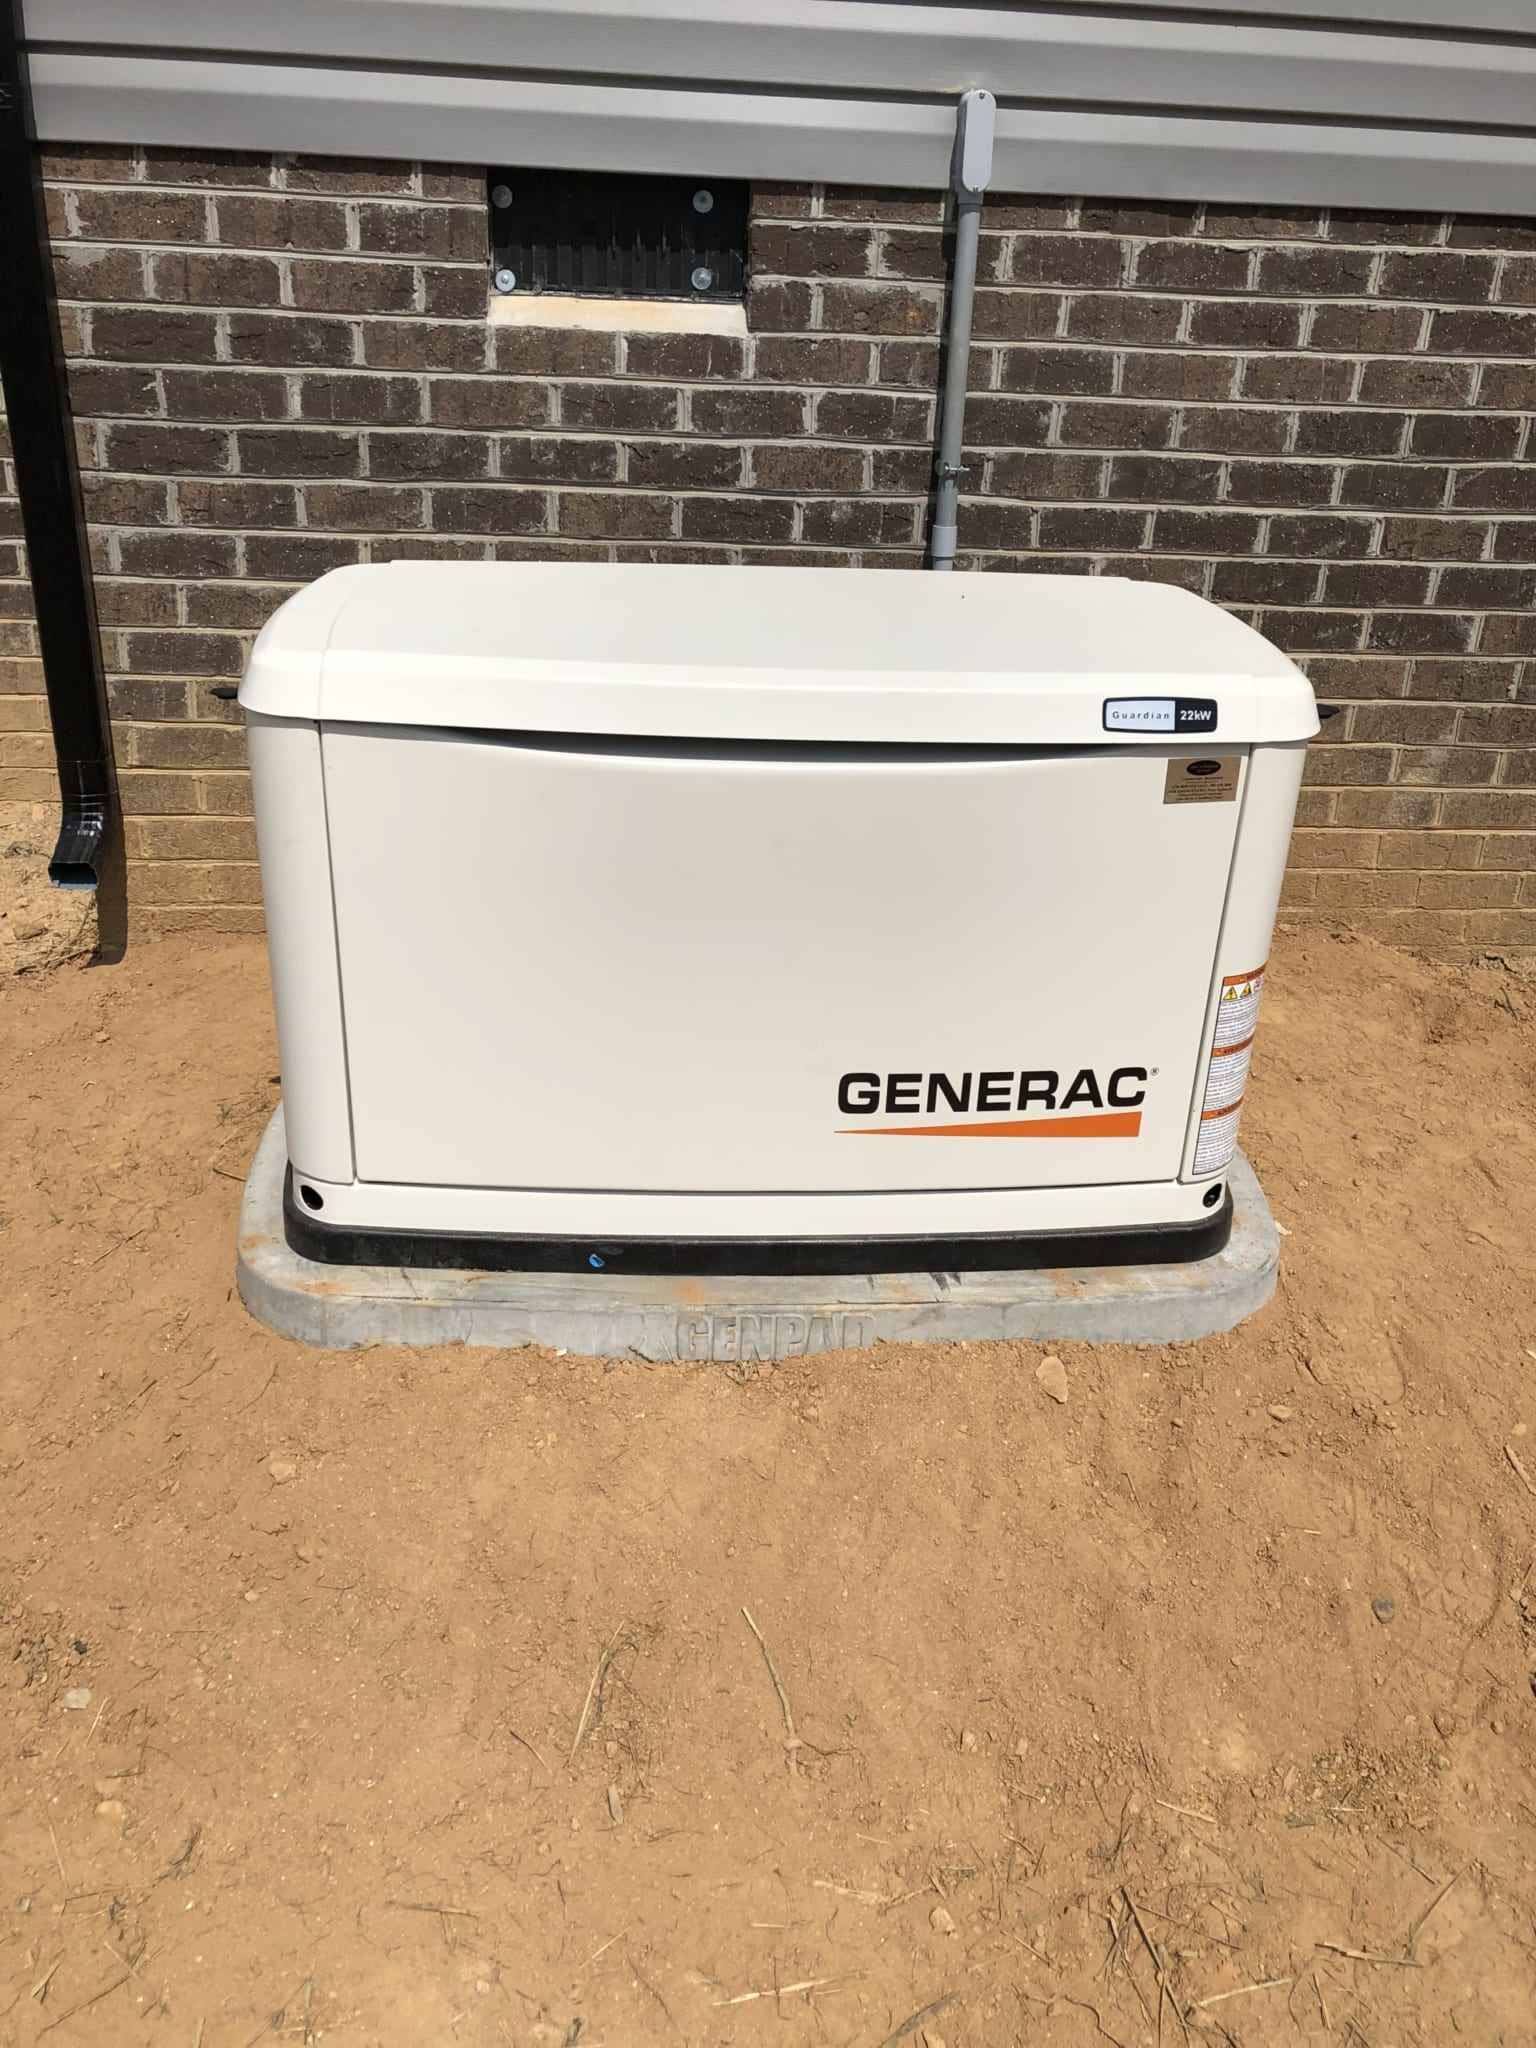 6.30.20 Generac Automatic Standby Generator